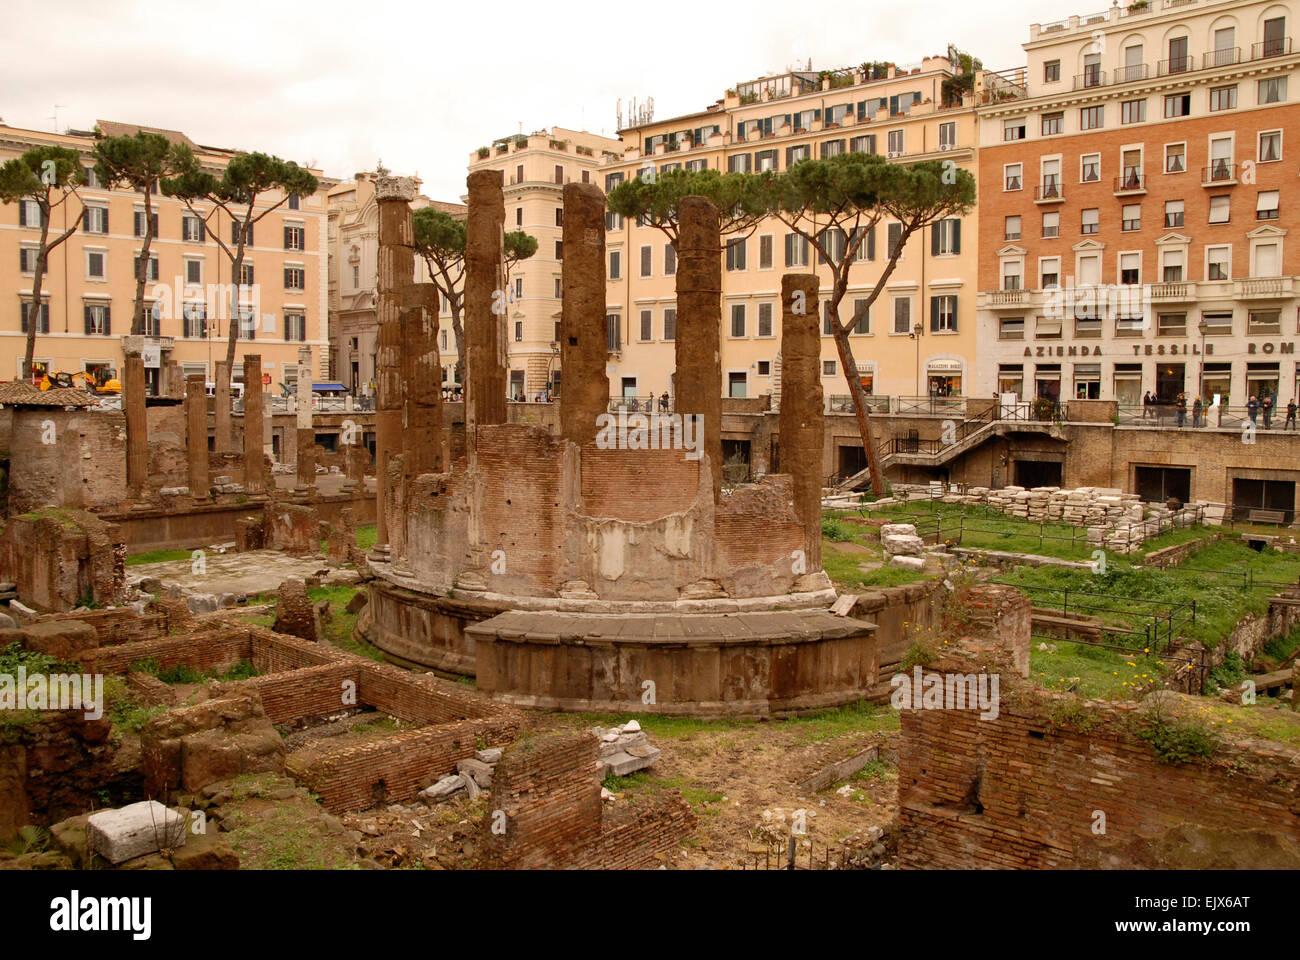 Aria Sacra, Rome, general view. - Stock Image